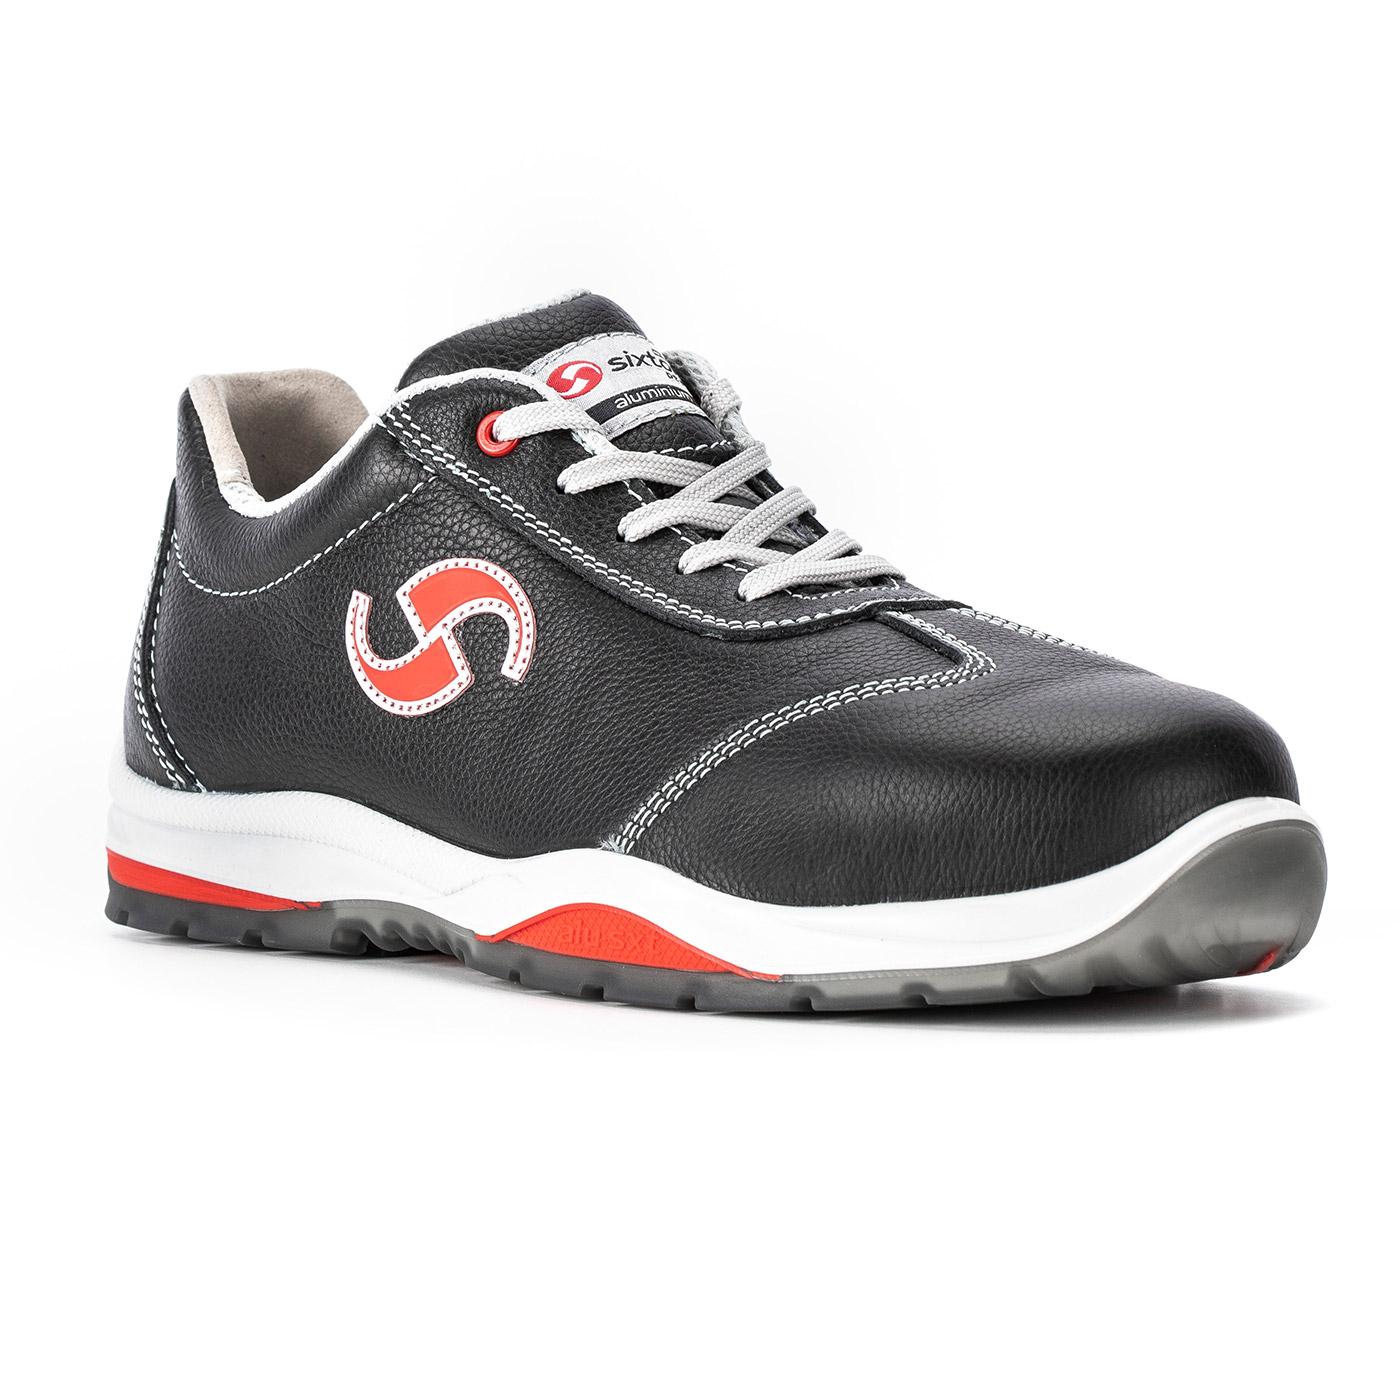 best sneakers 7b5d6 cdf84 Sixton Sicherheits Halbschuh DANCE S3 SRC